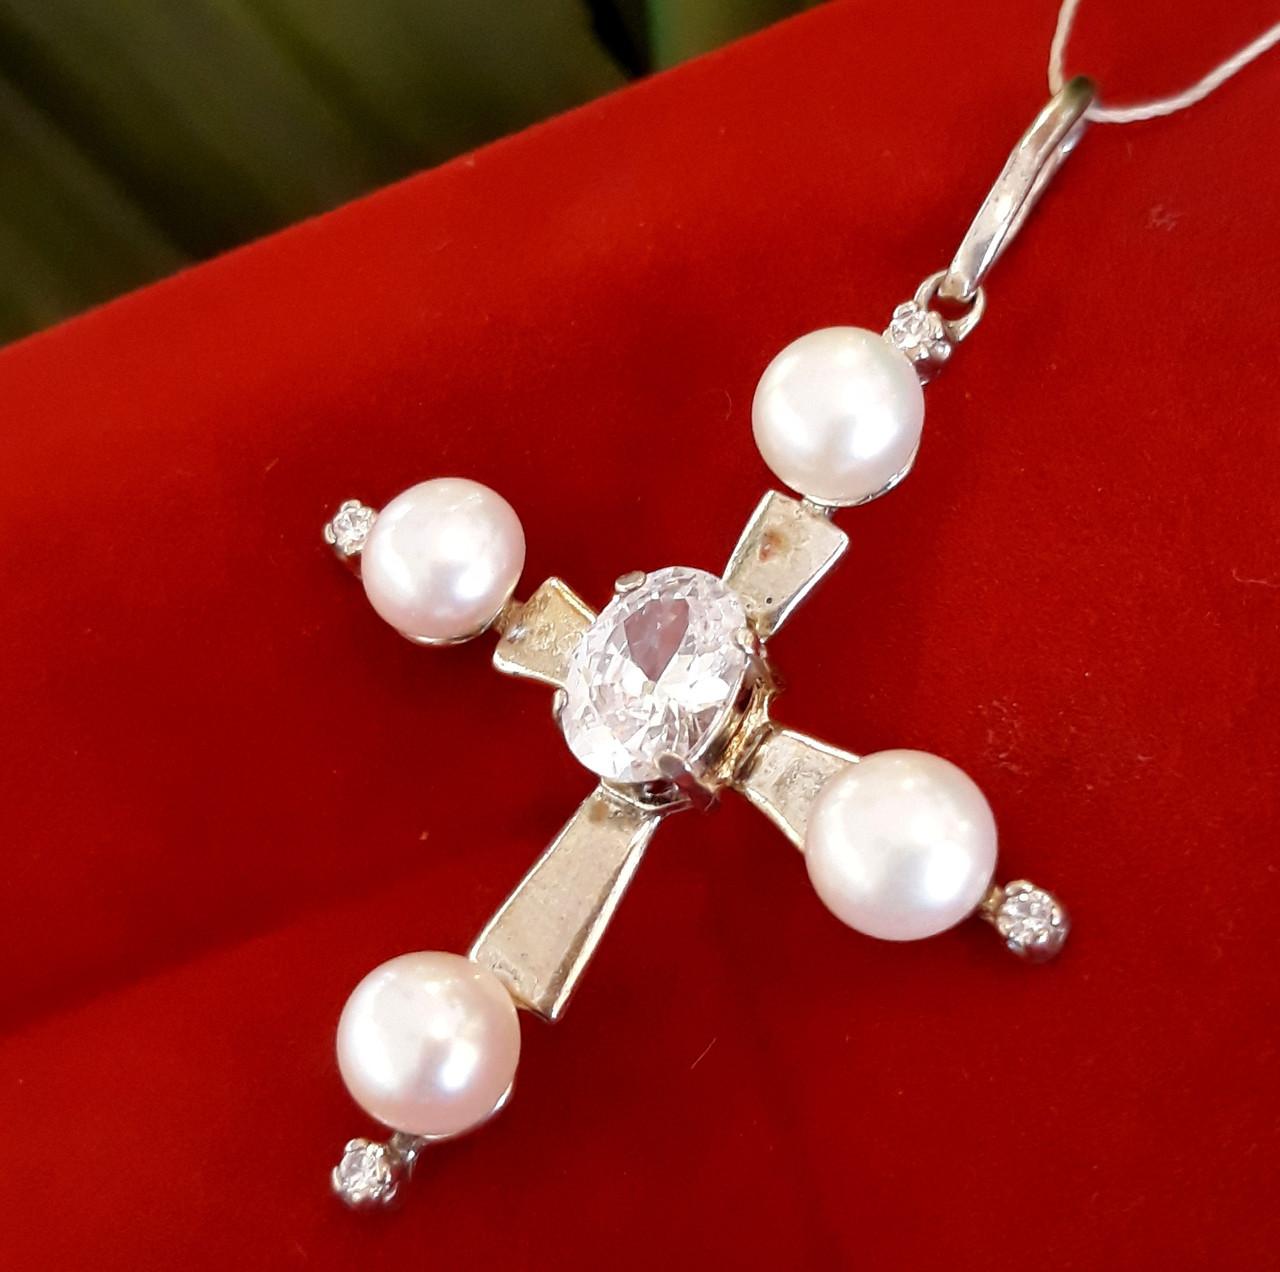 Серебряный крестик с жемчугом